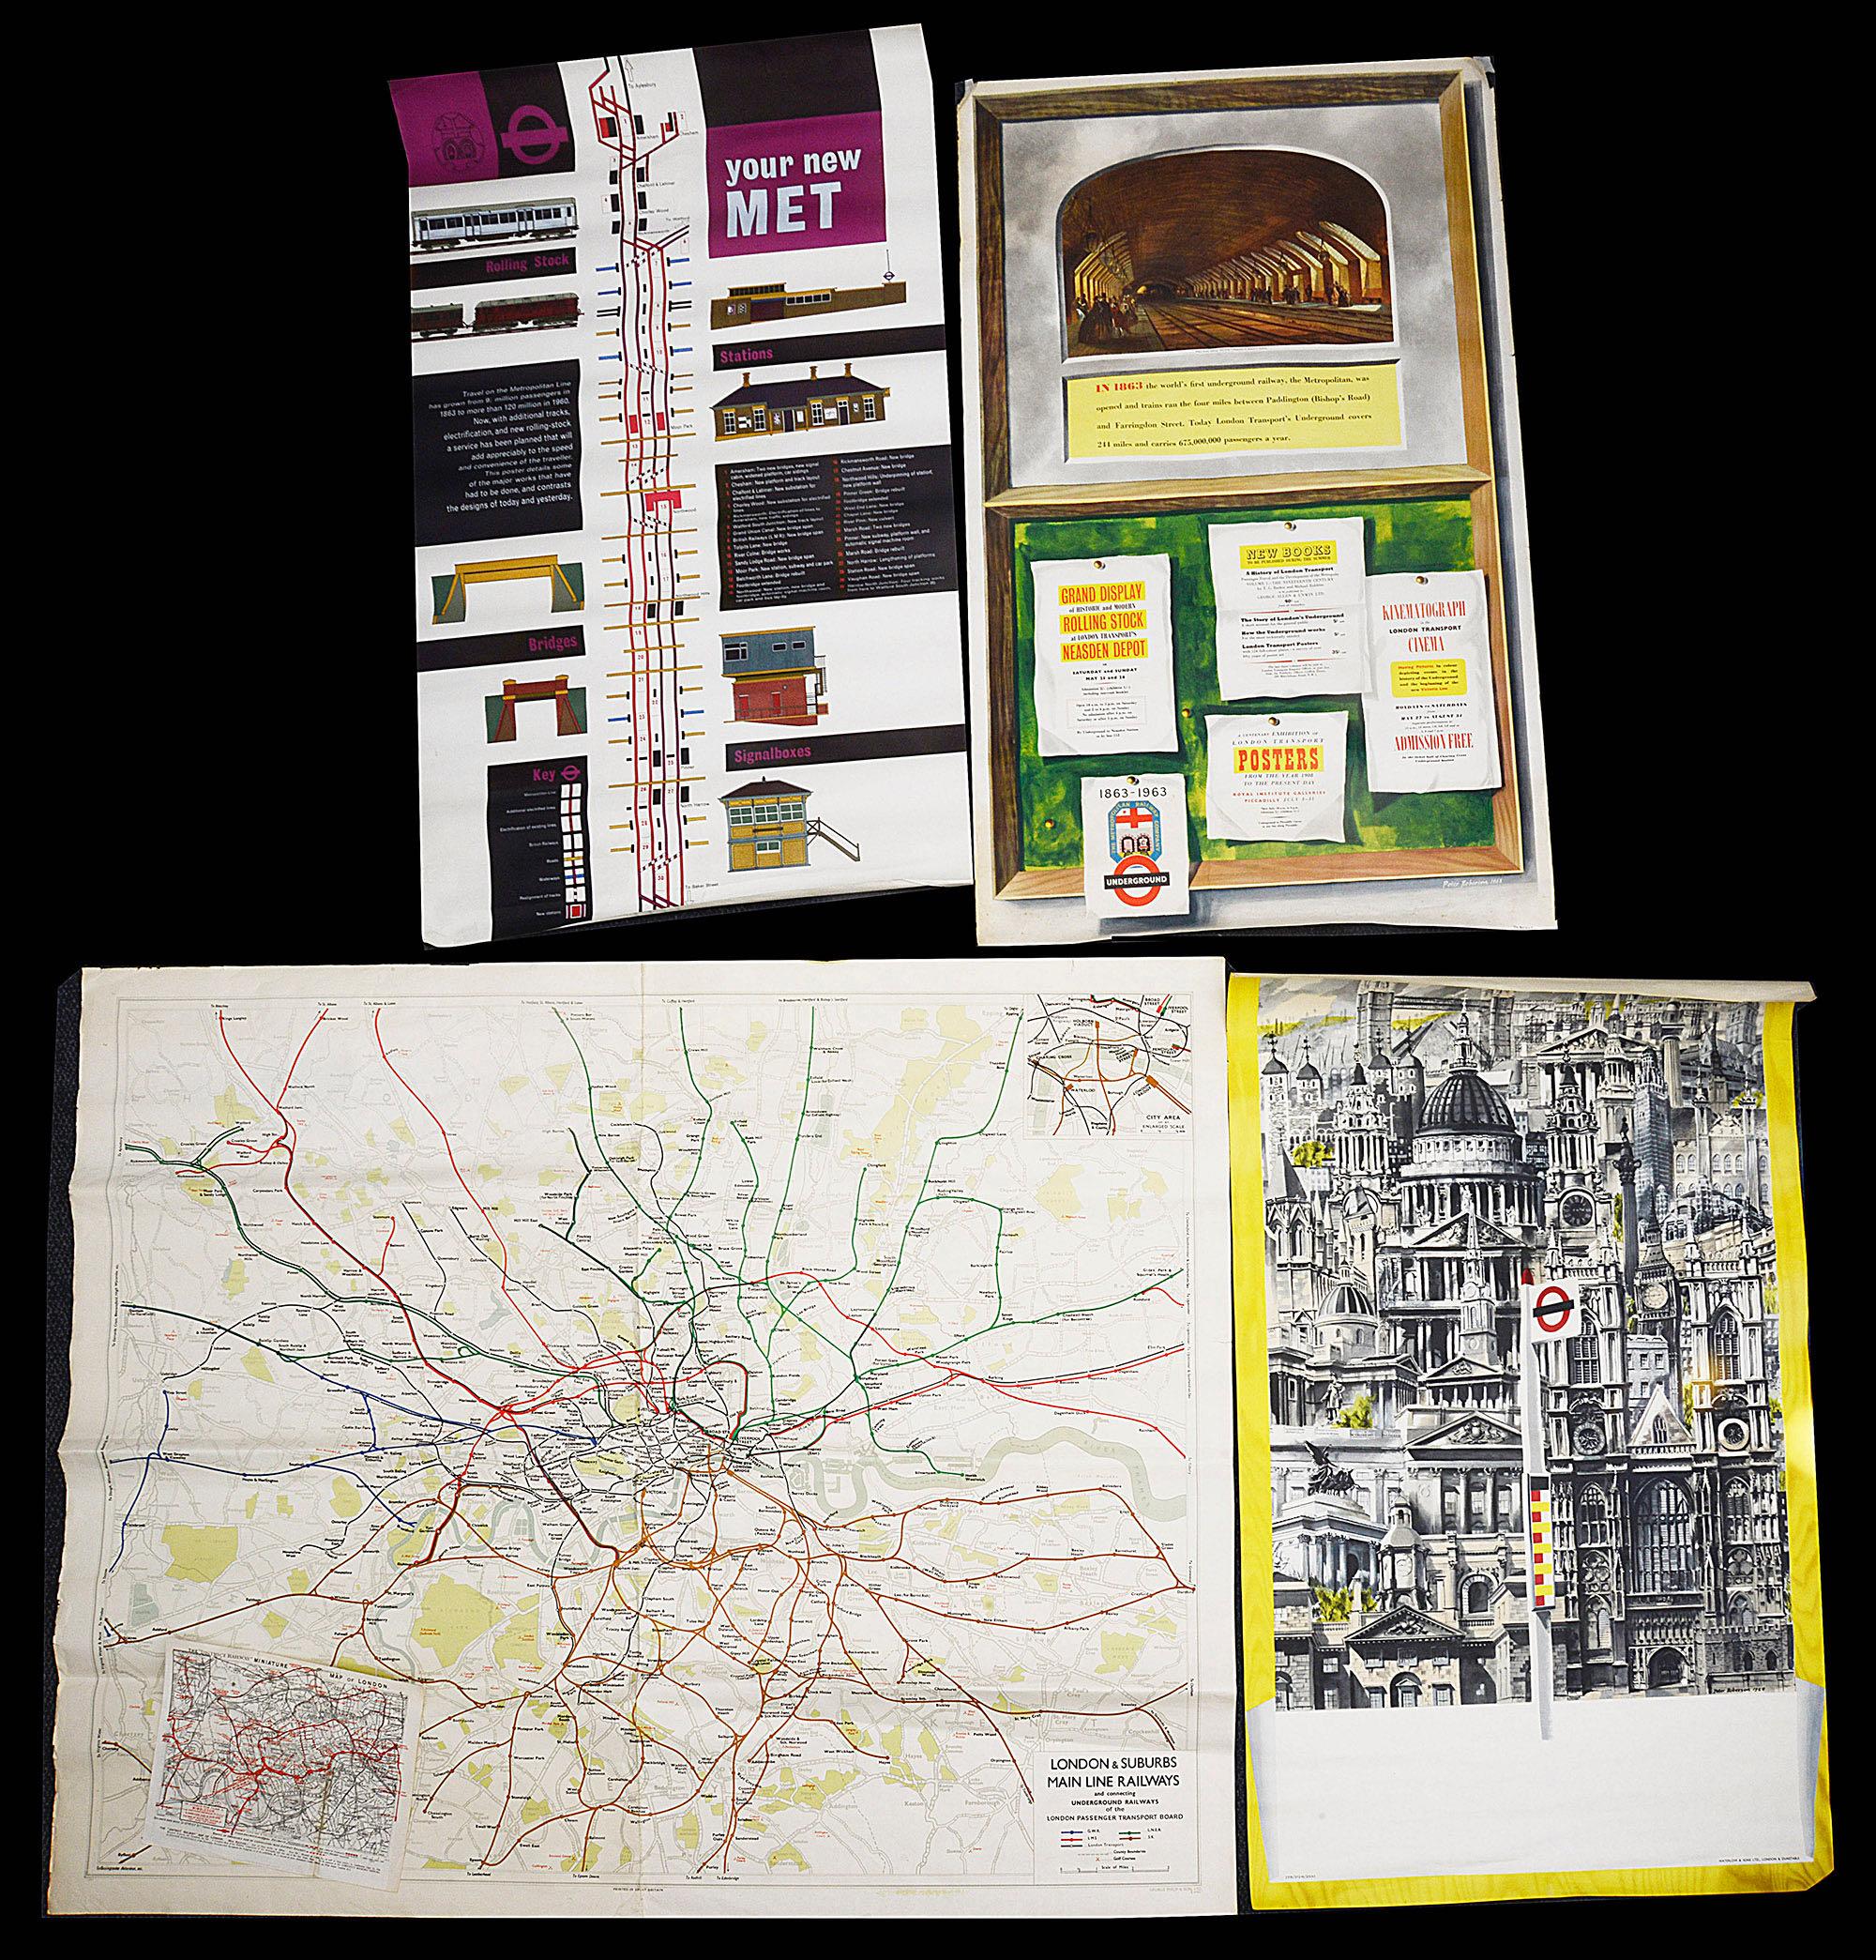 Three London Underground posters and three paper maps